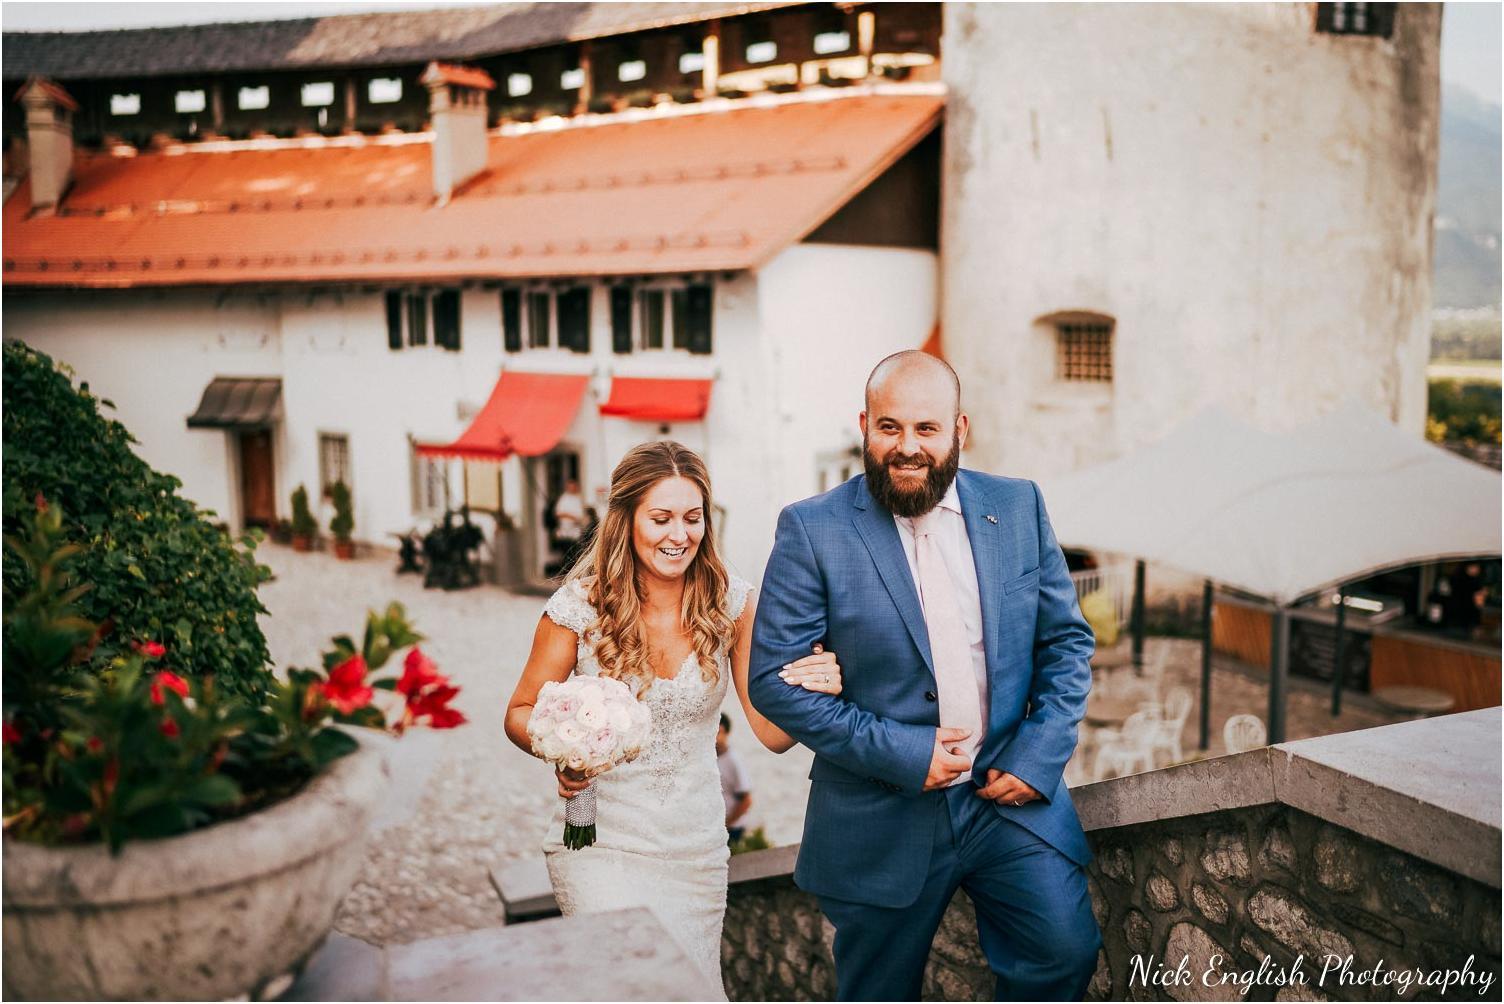 Destination_Wedding_Photographer_Slovenia_Nick_English_Photography-70-26.jpg